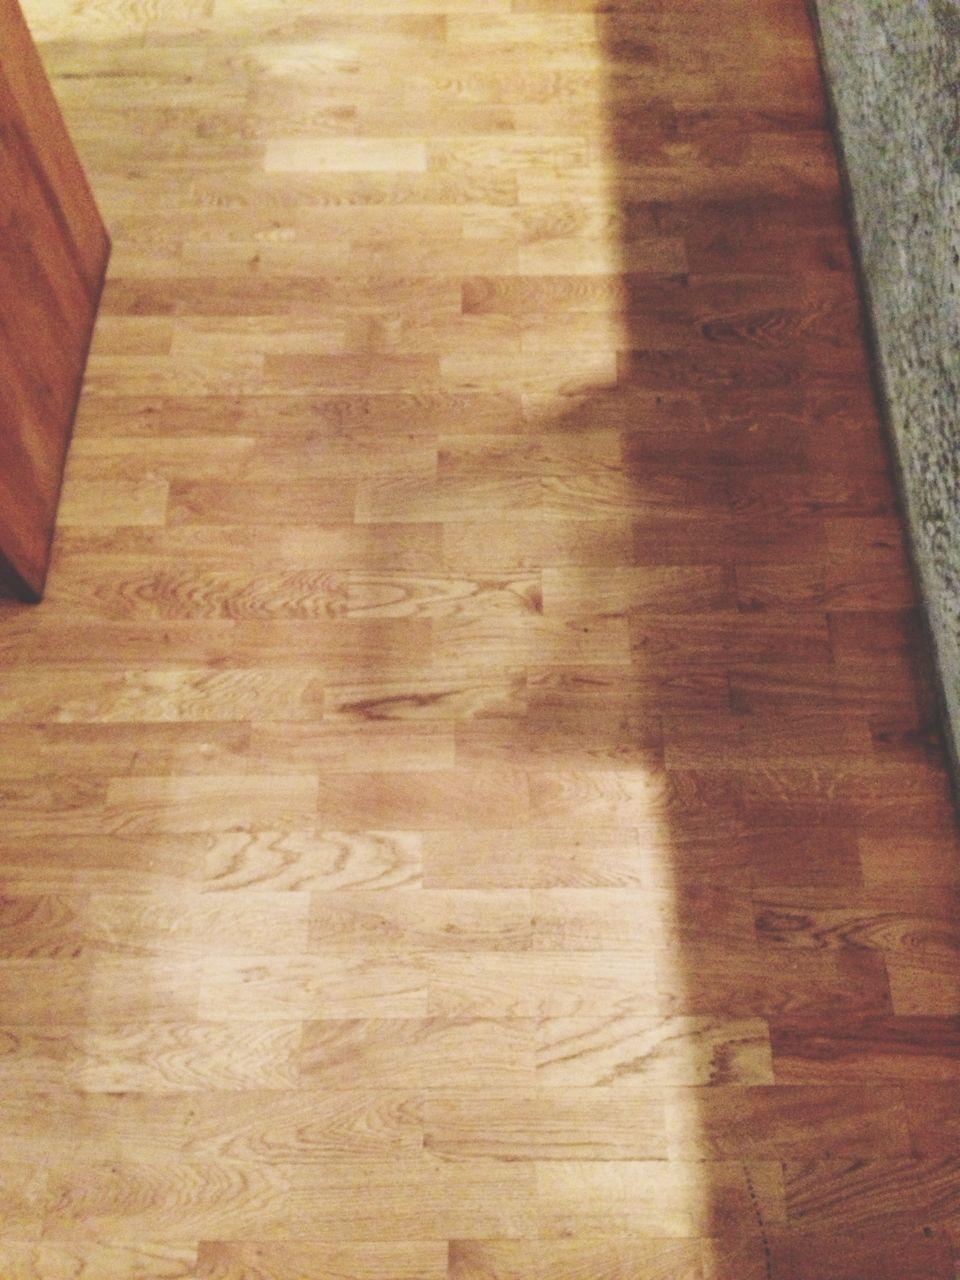 hardwood floor, wood - material, flooring, indoors, hardwood, wooden floor, brown, no people, wood paneling, home interior, wood grain, close-up, day